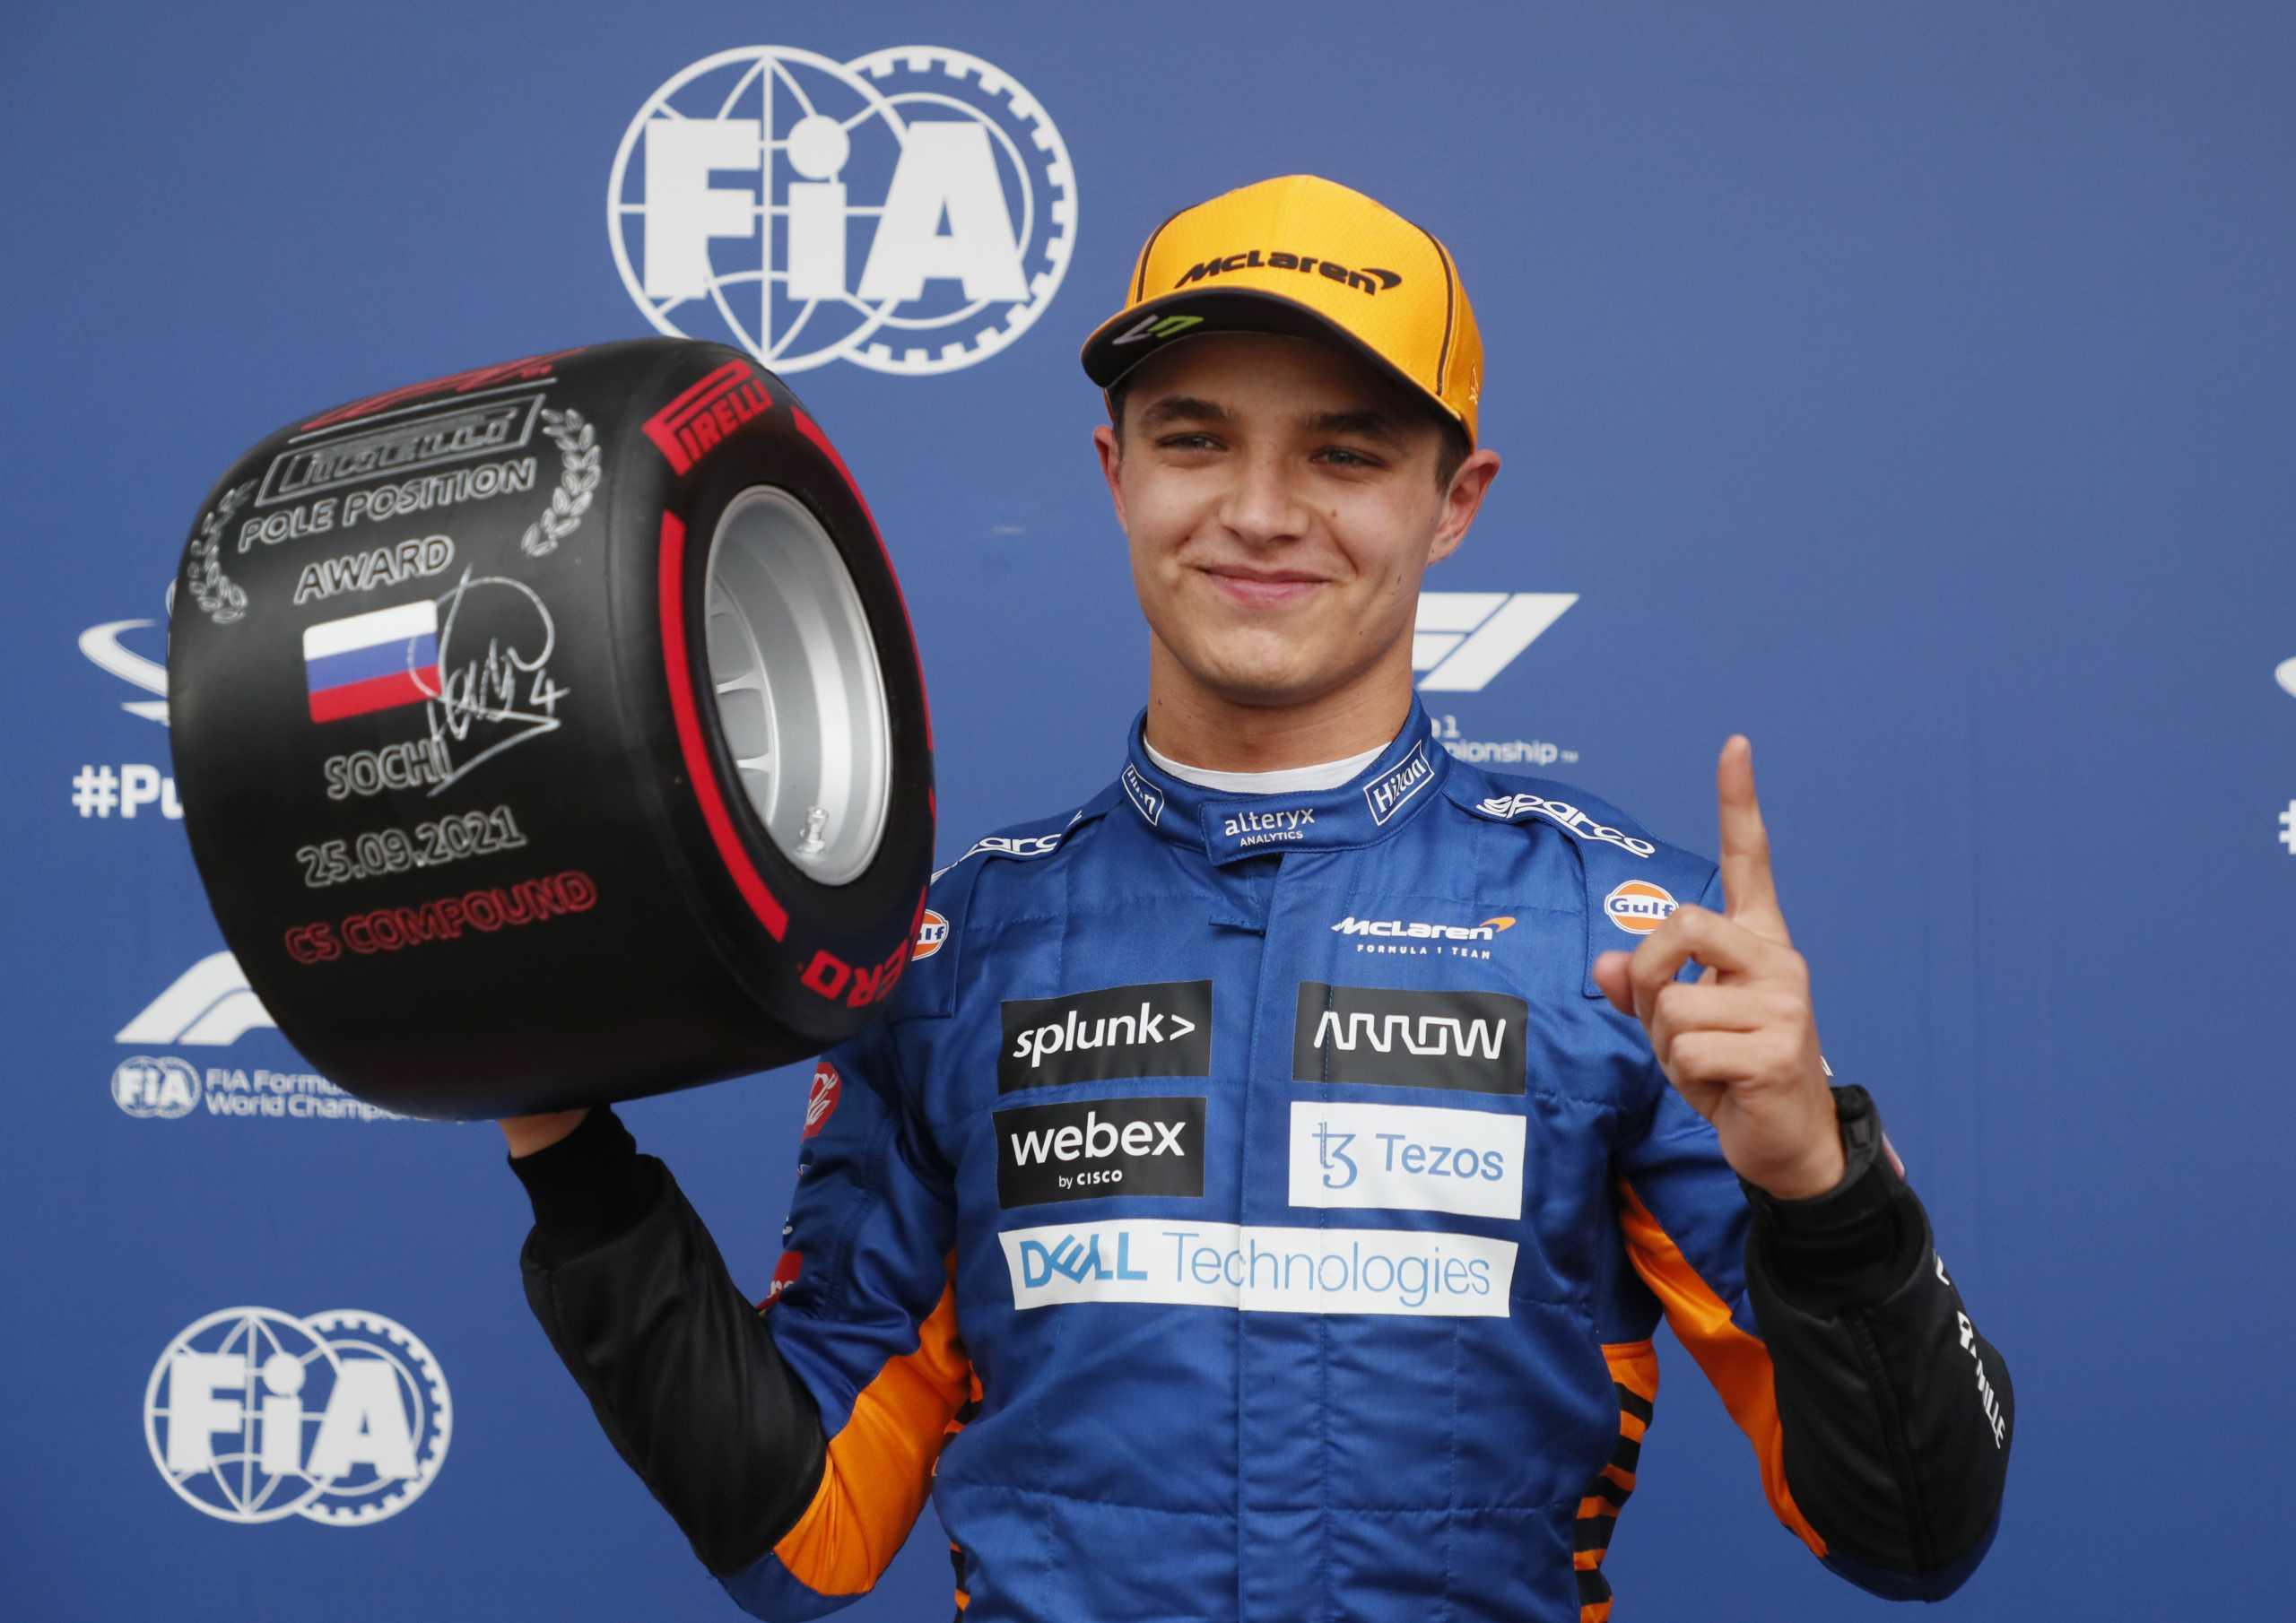 Formula 1: Ιστορική pole position για Λάντο Νόρις στο βροχερό Σότσι